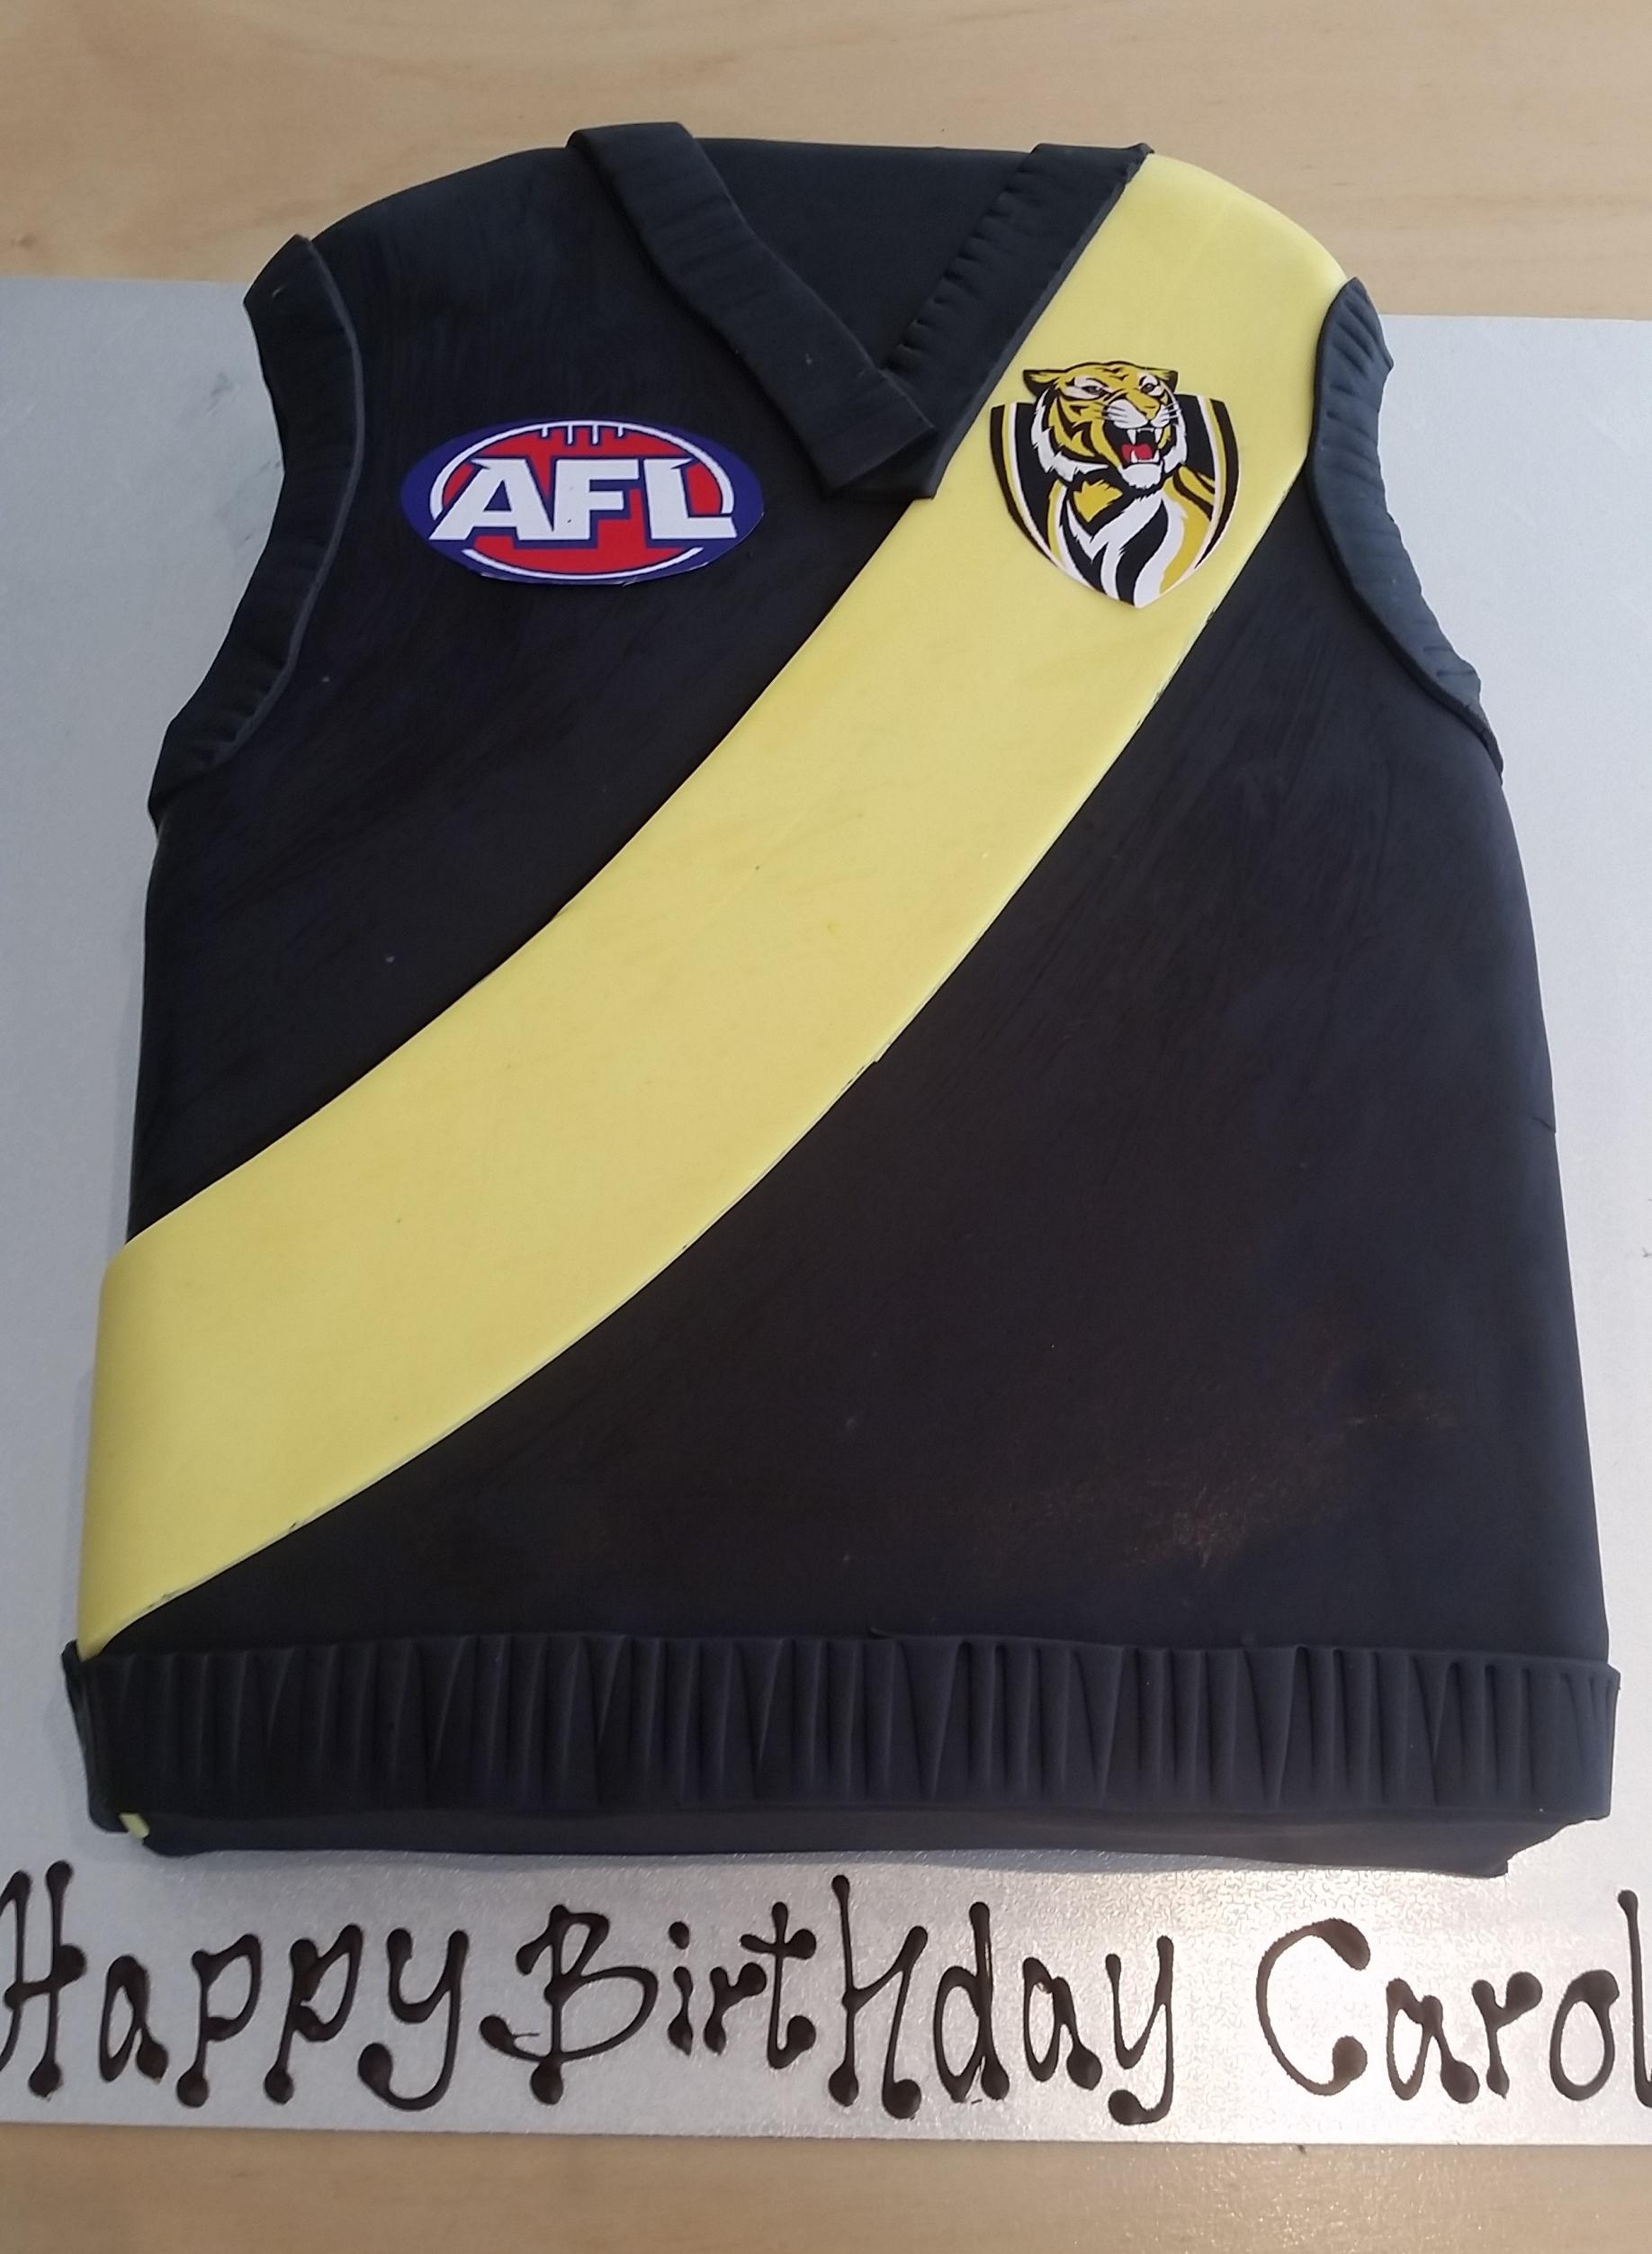 AFL Richmond Football Jersey Cake